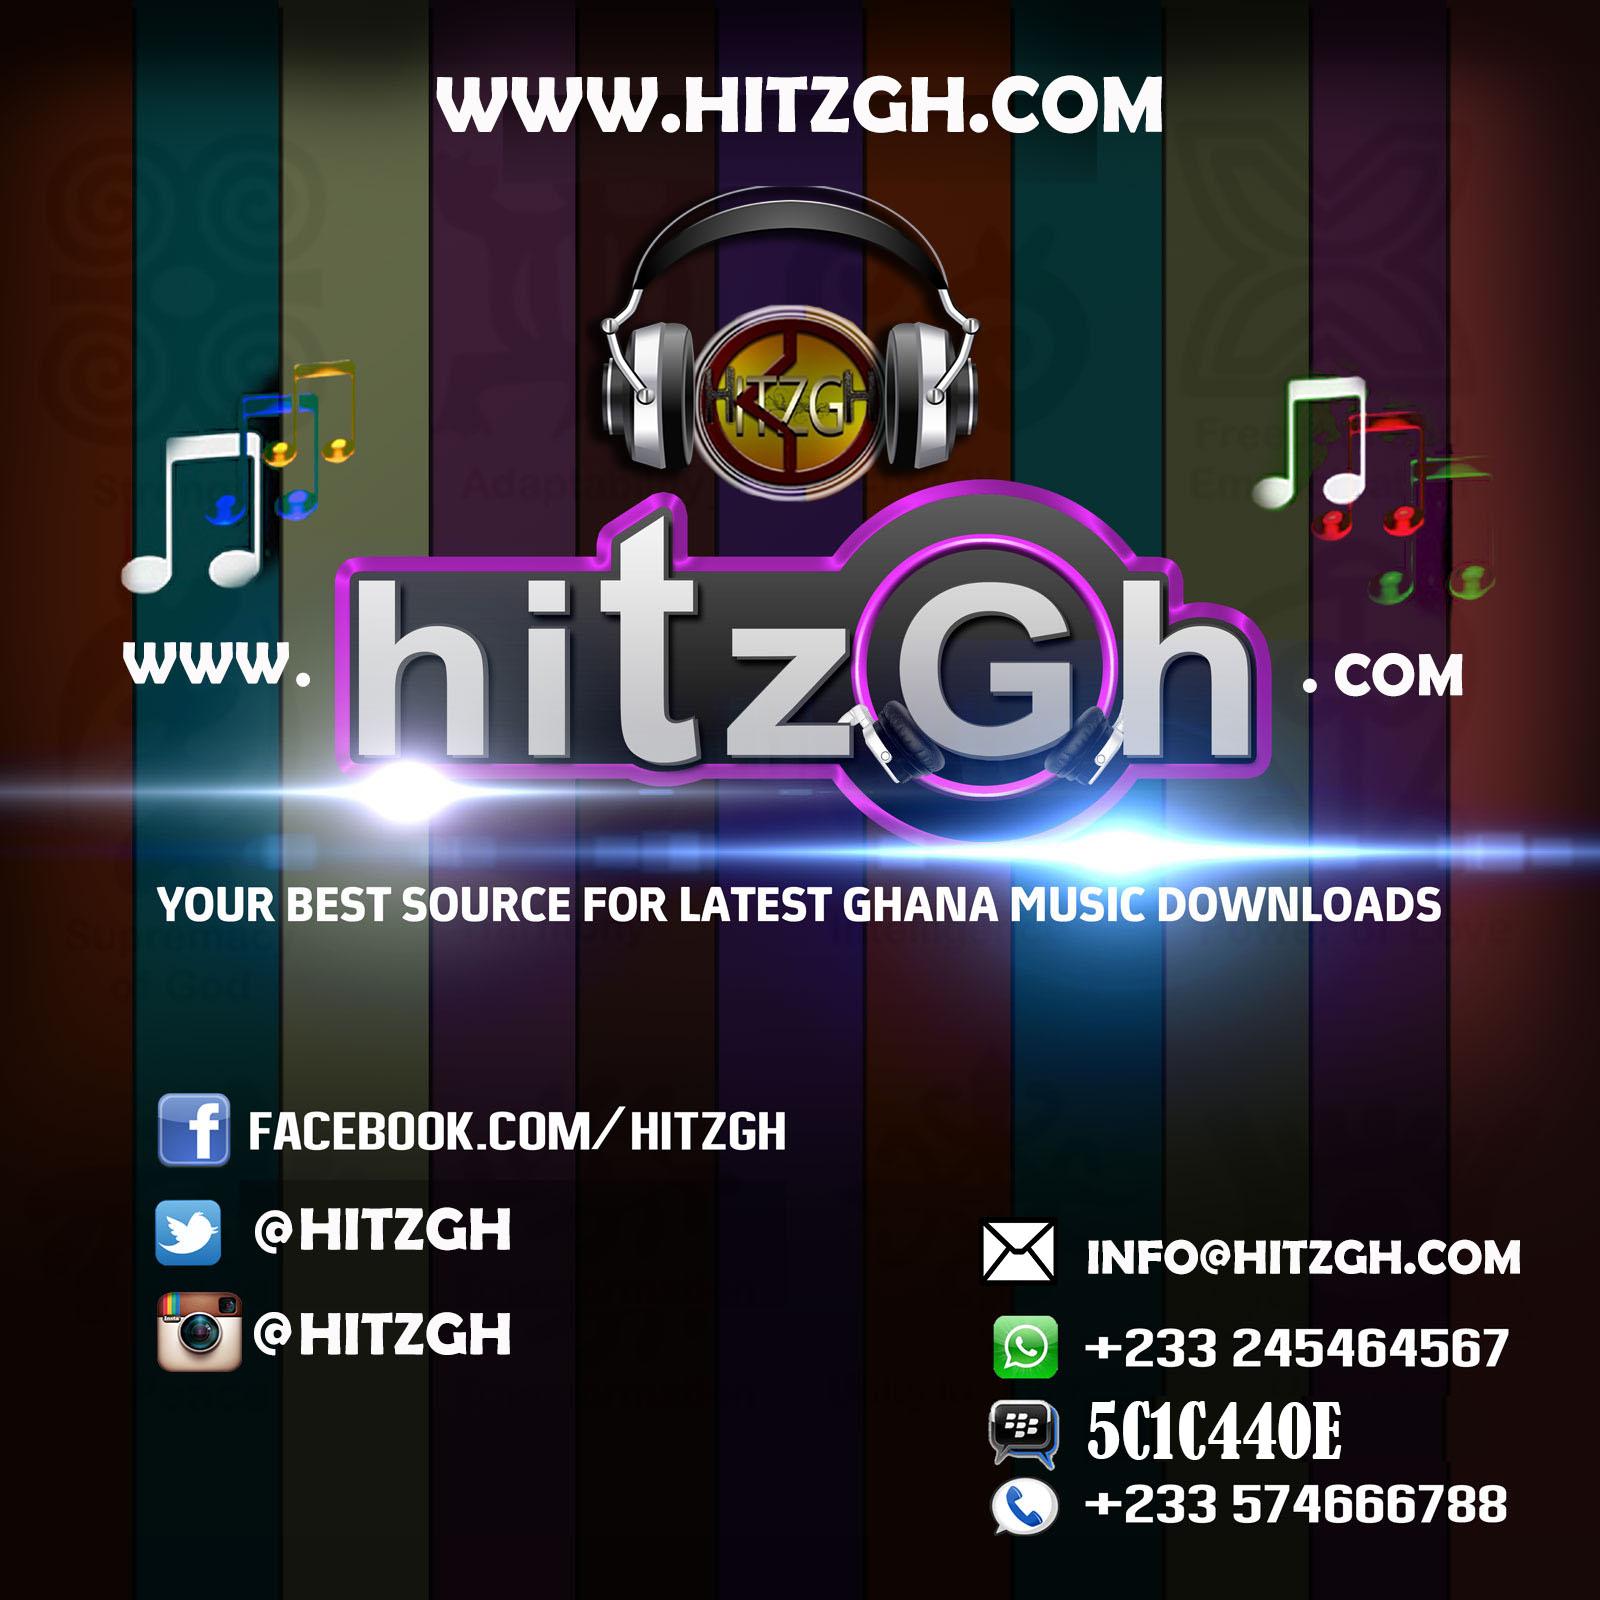 HITZGH logo